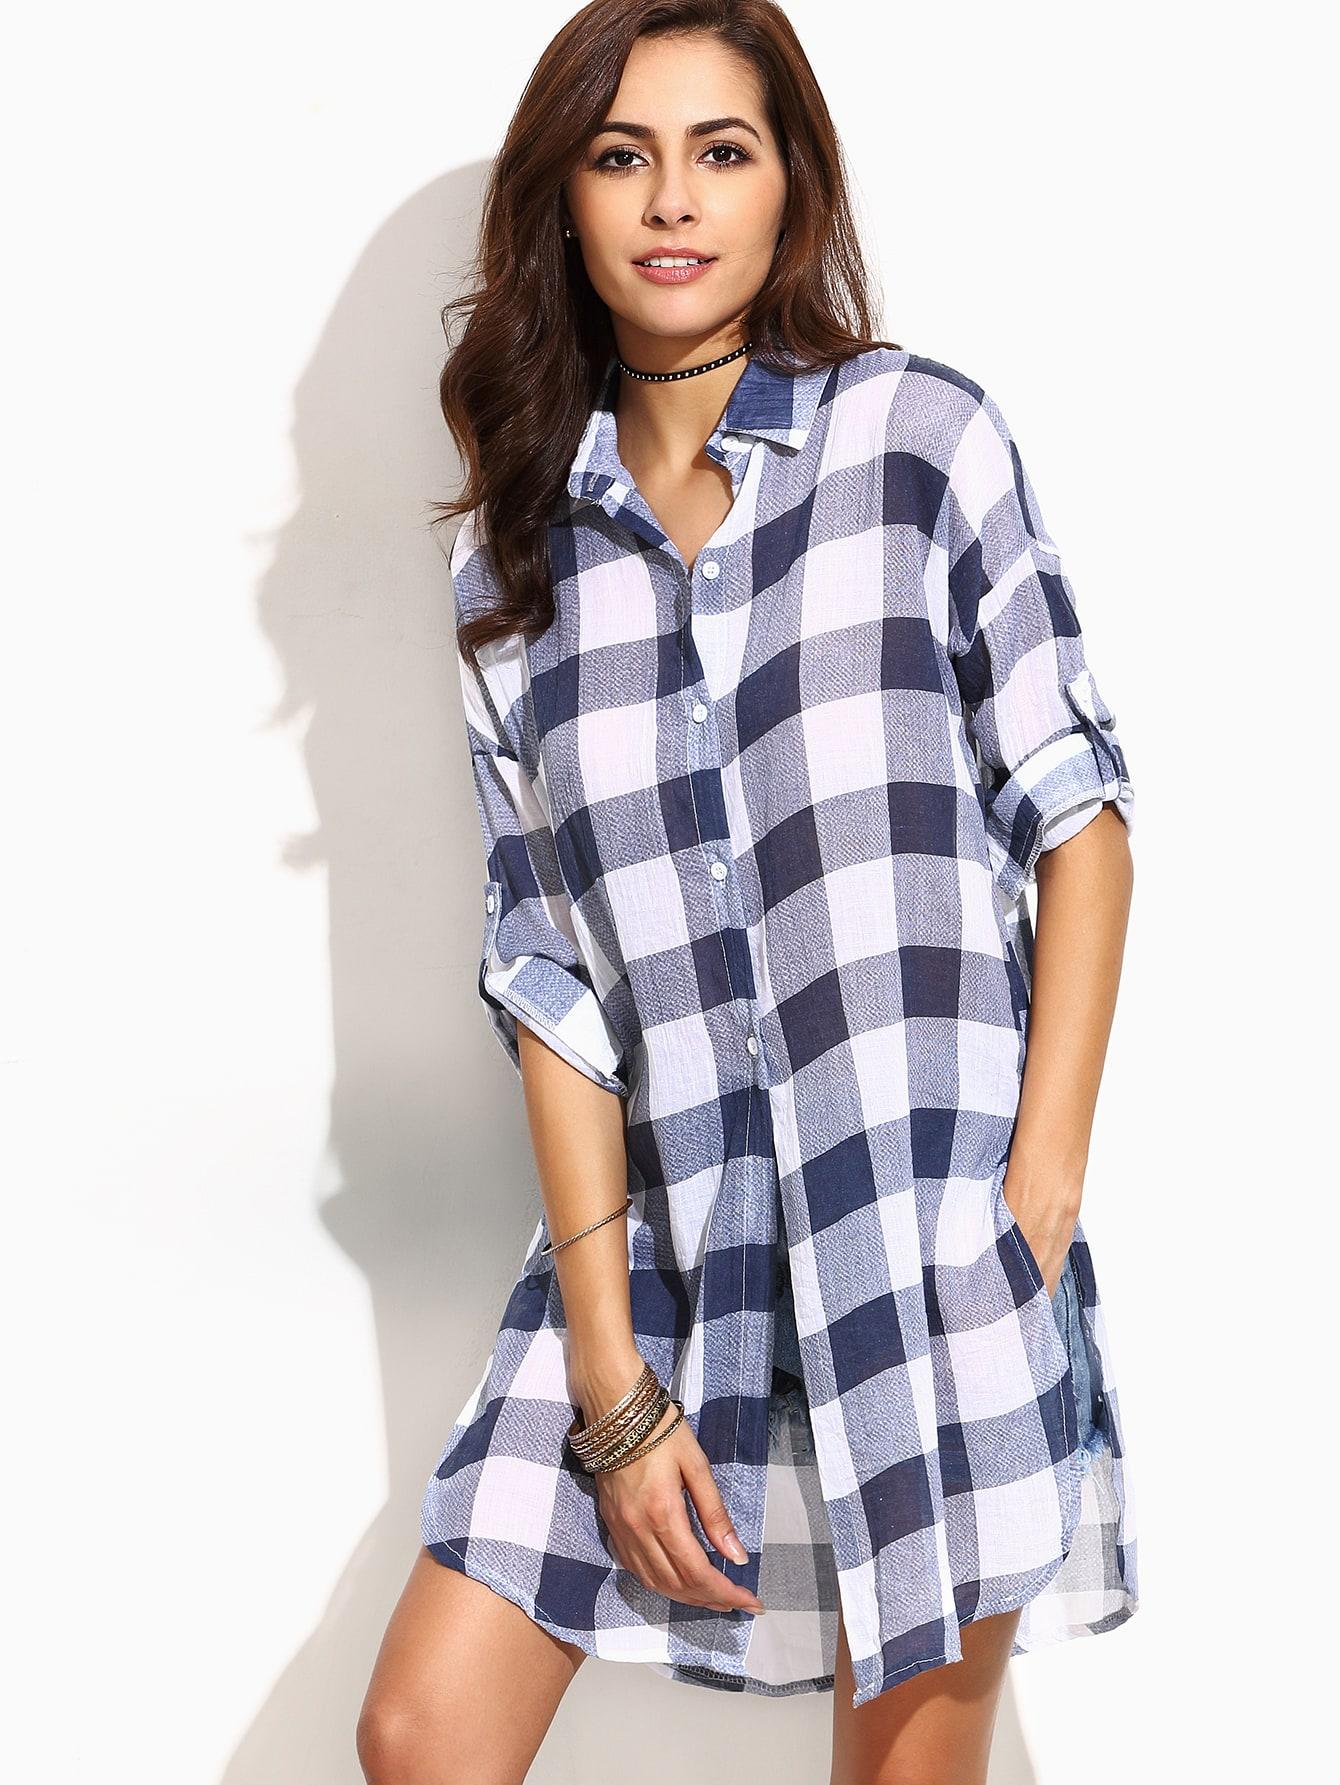 blouse160726003_2